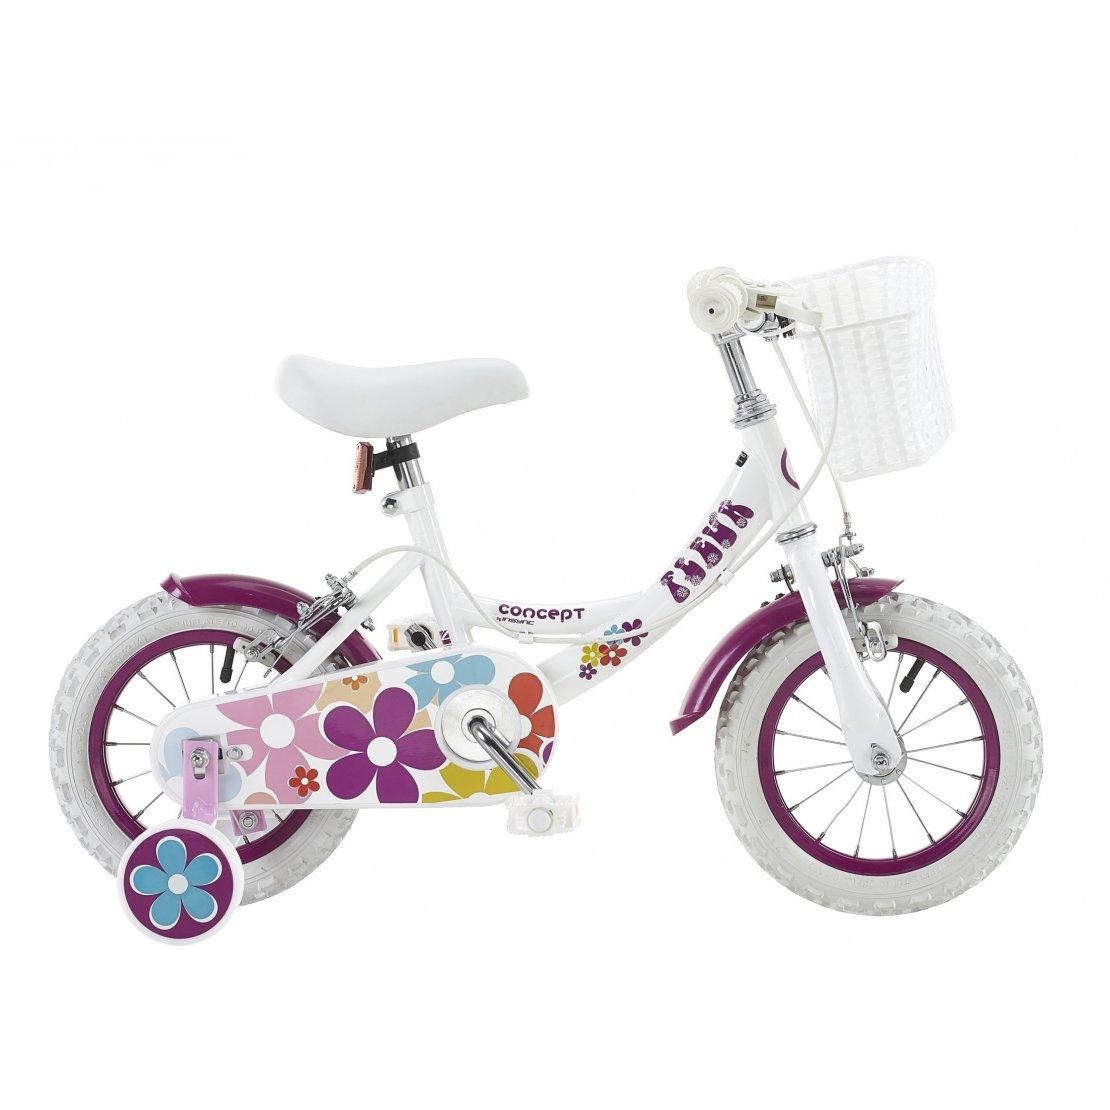 "Insync Fleur 12"" Wheel Girls Bicycle (IN0122)"